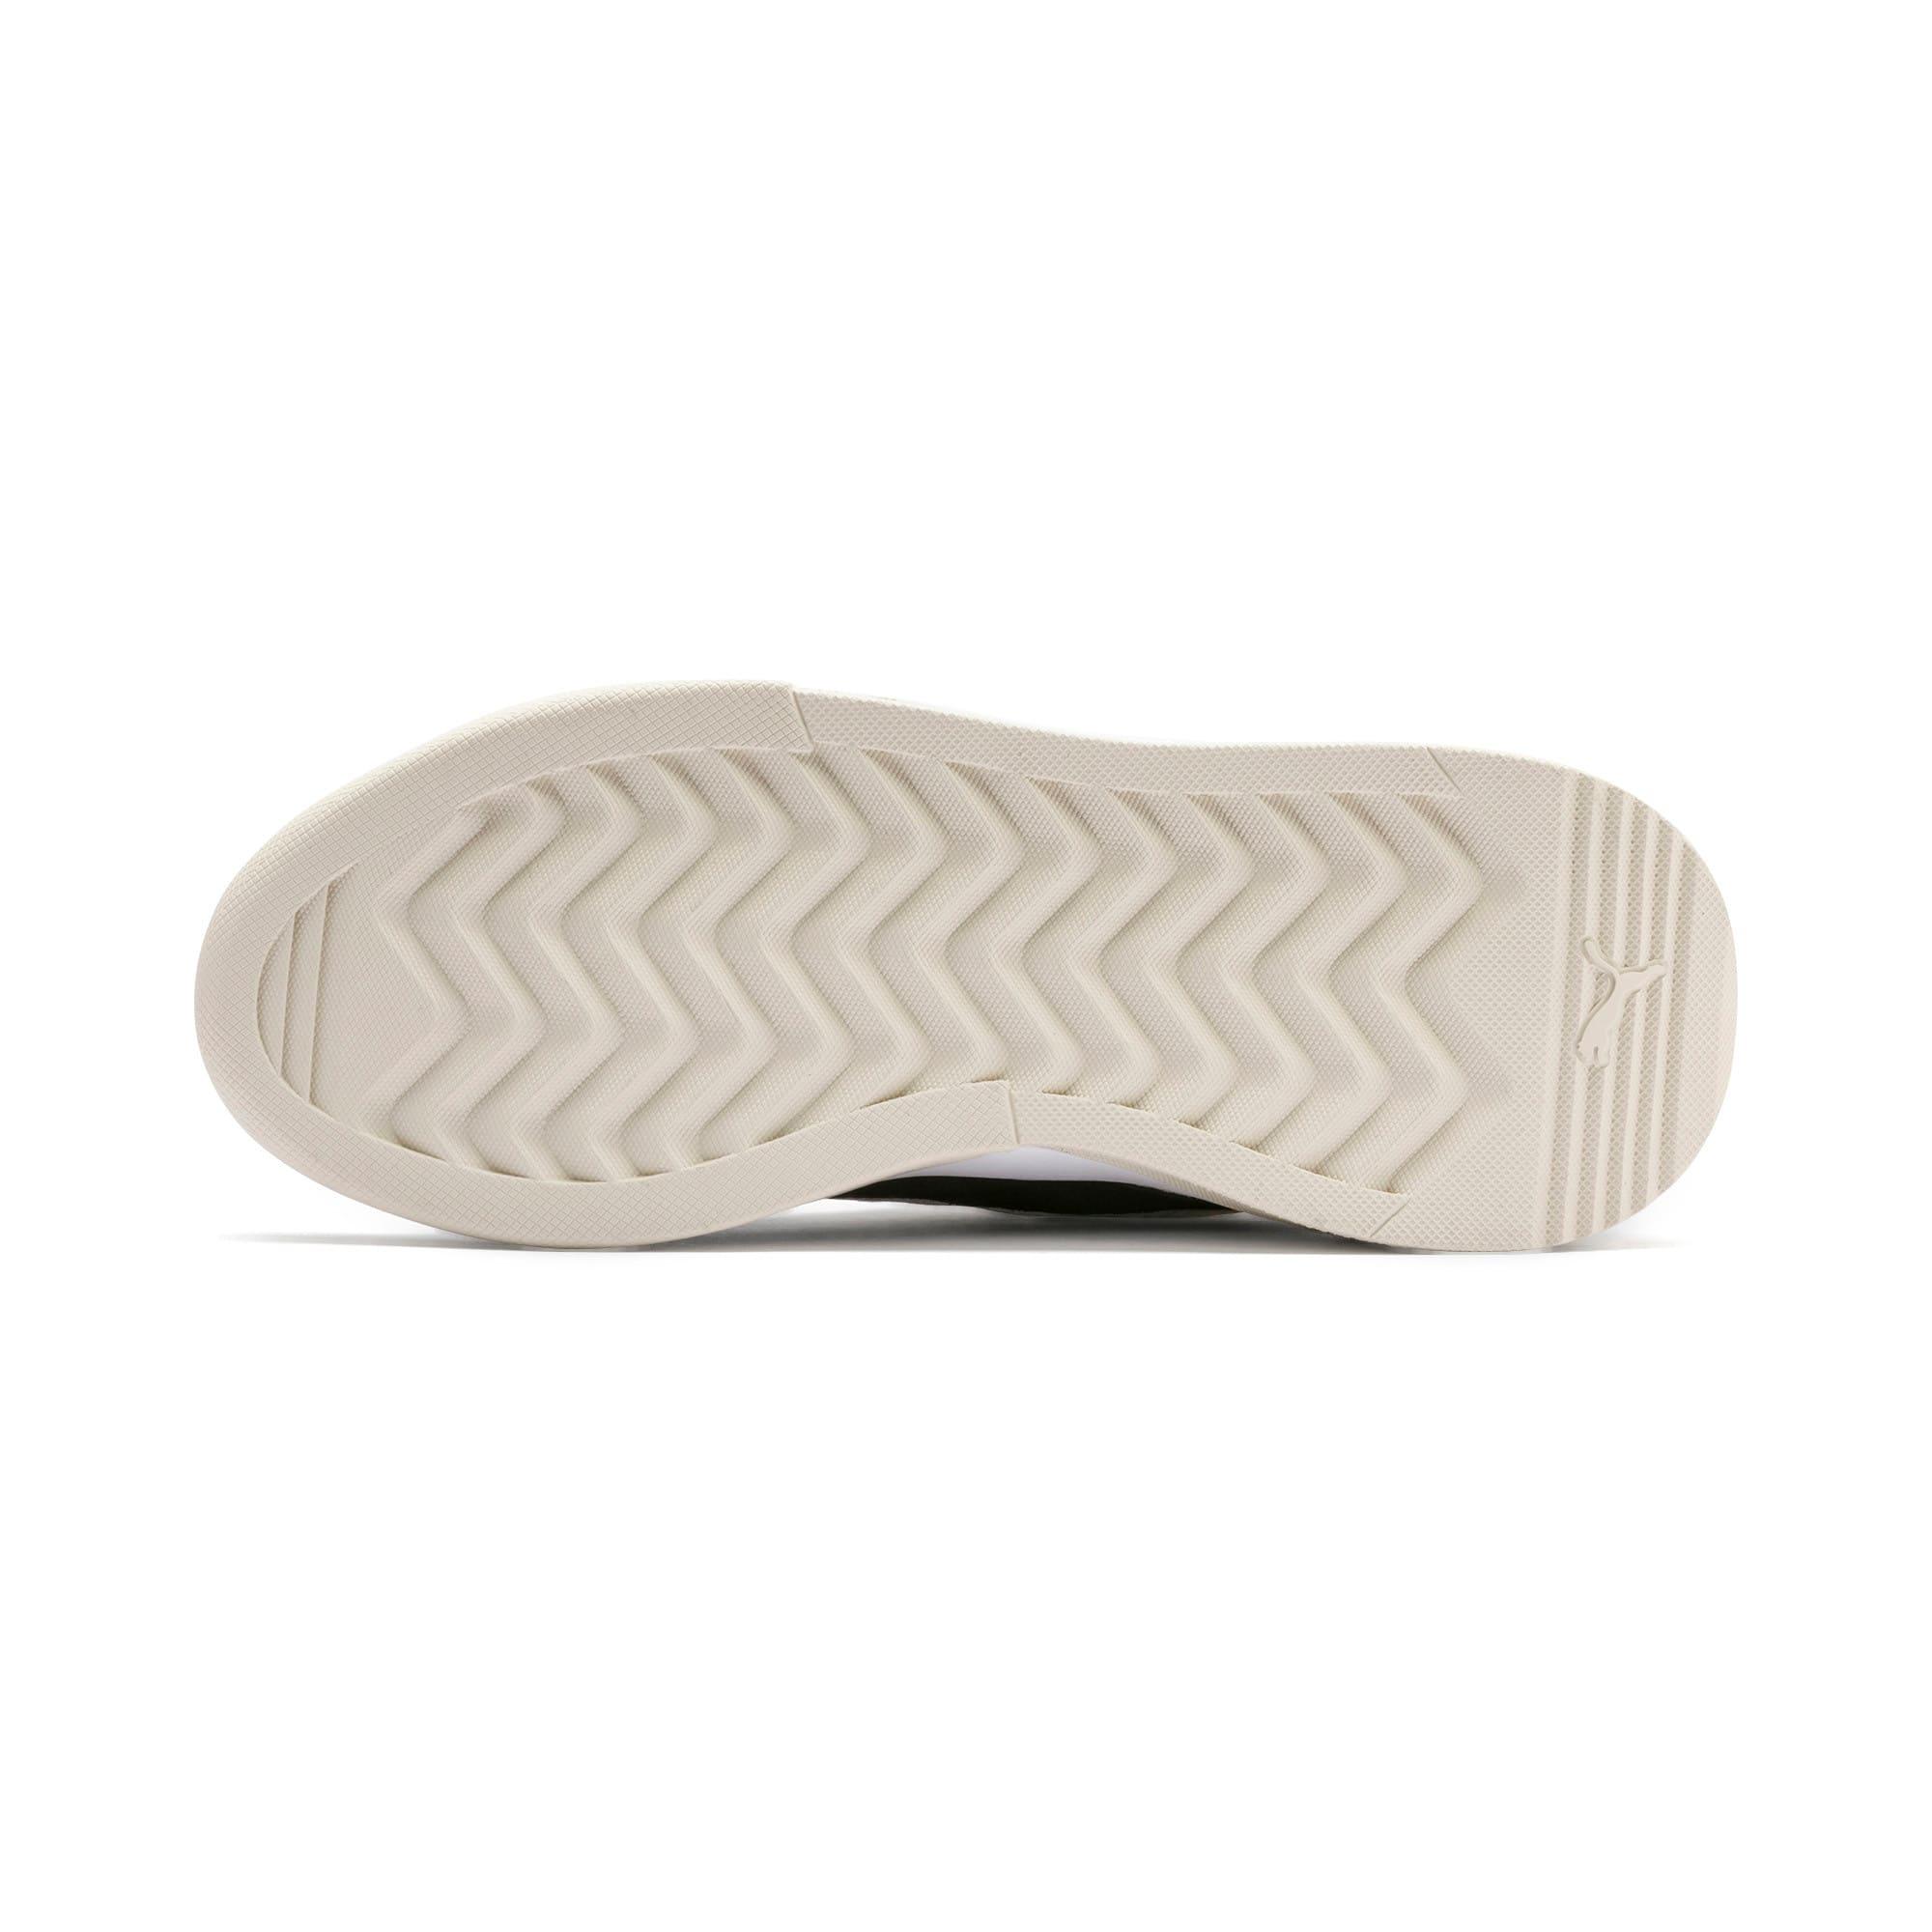 Thumbnail 5 of Aeon Heritage Women's Sneakers, Puma White-Puma Black, medium